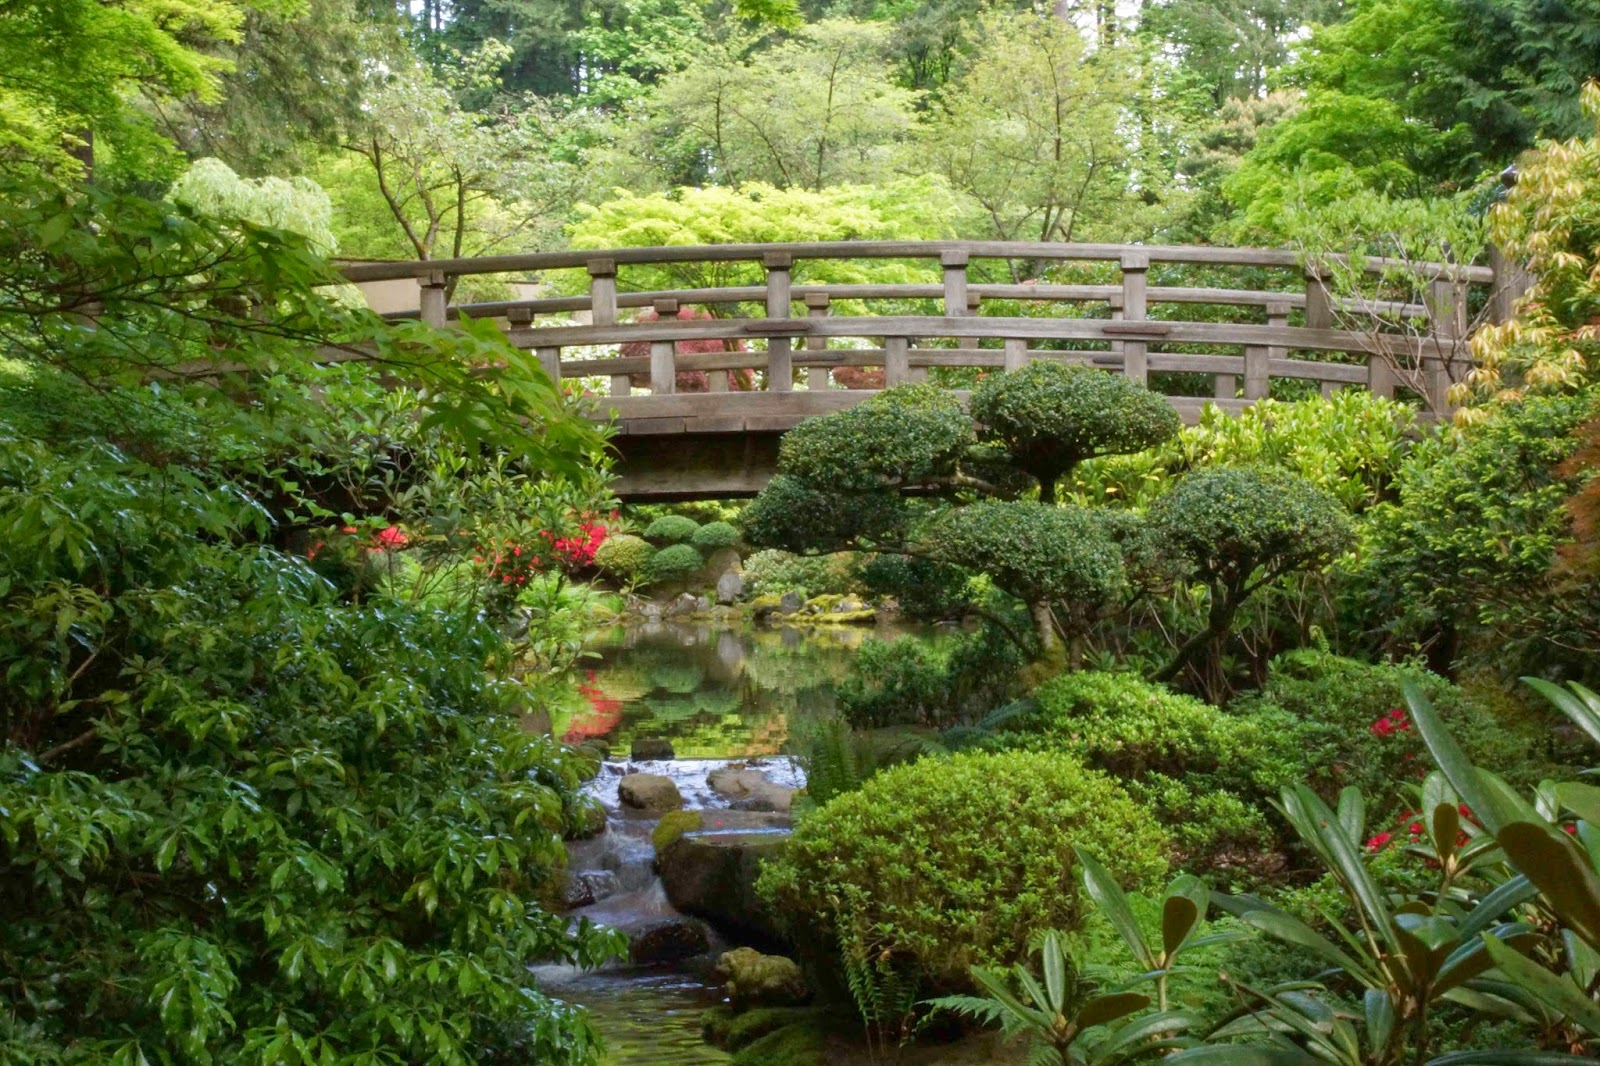 20 image gallery of astounding inspiration alabama gardens